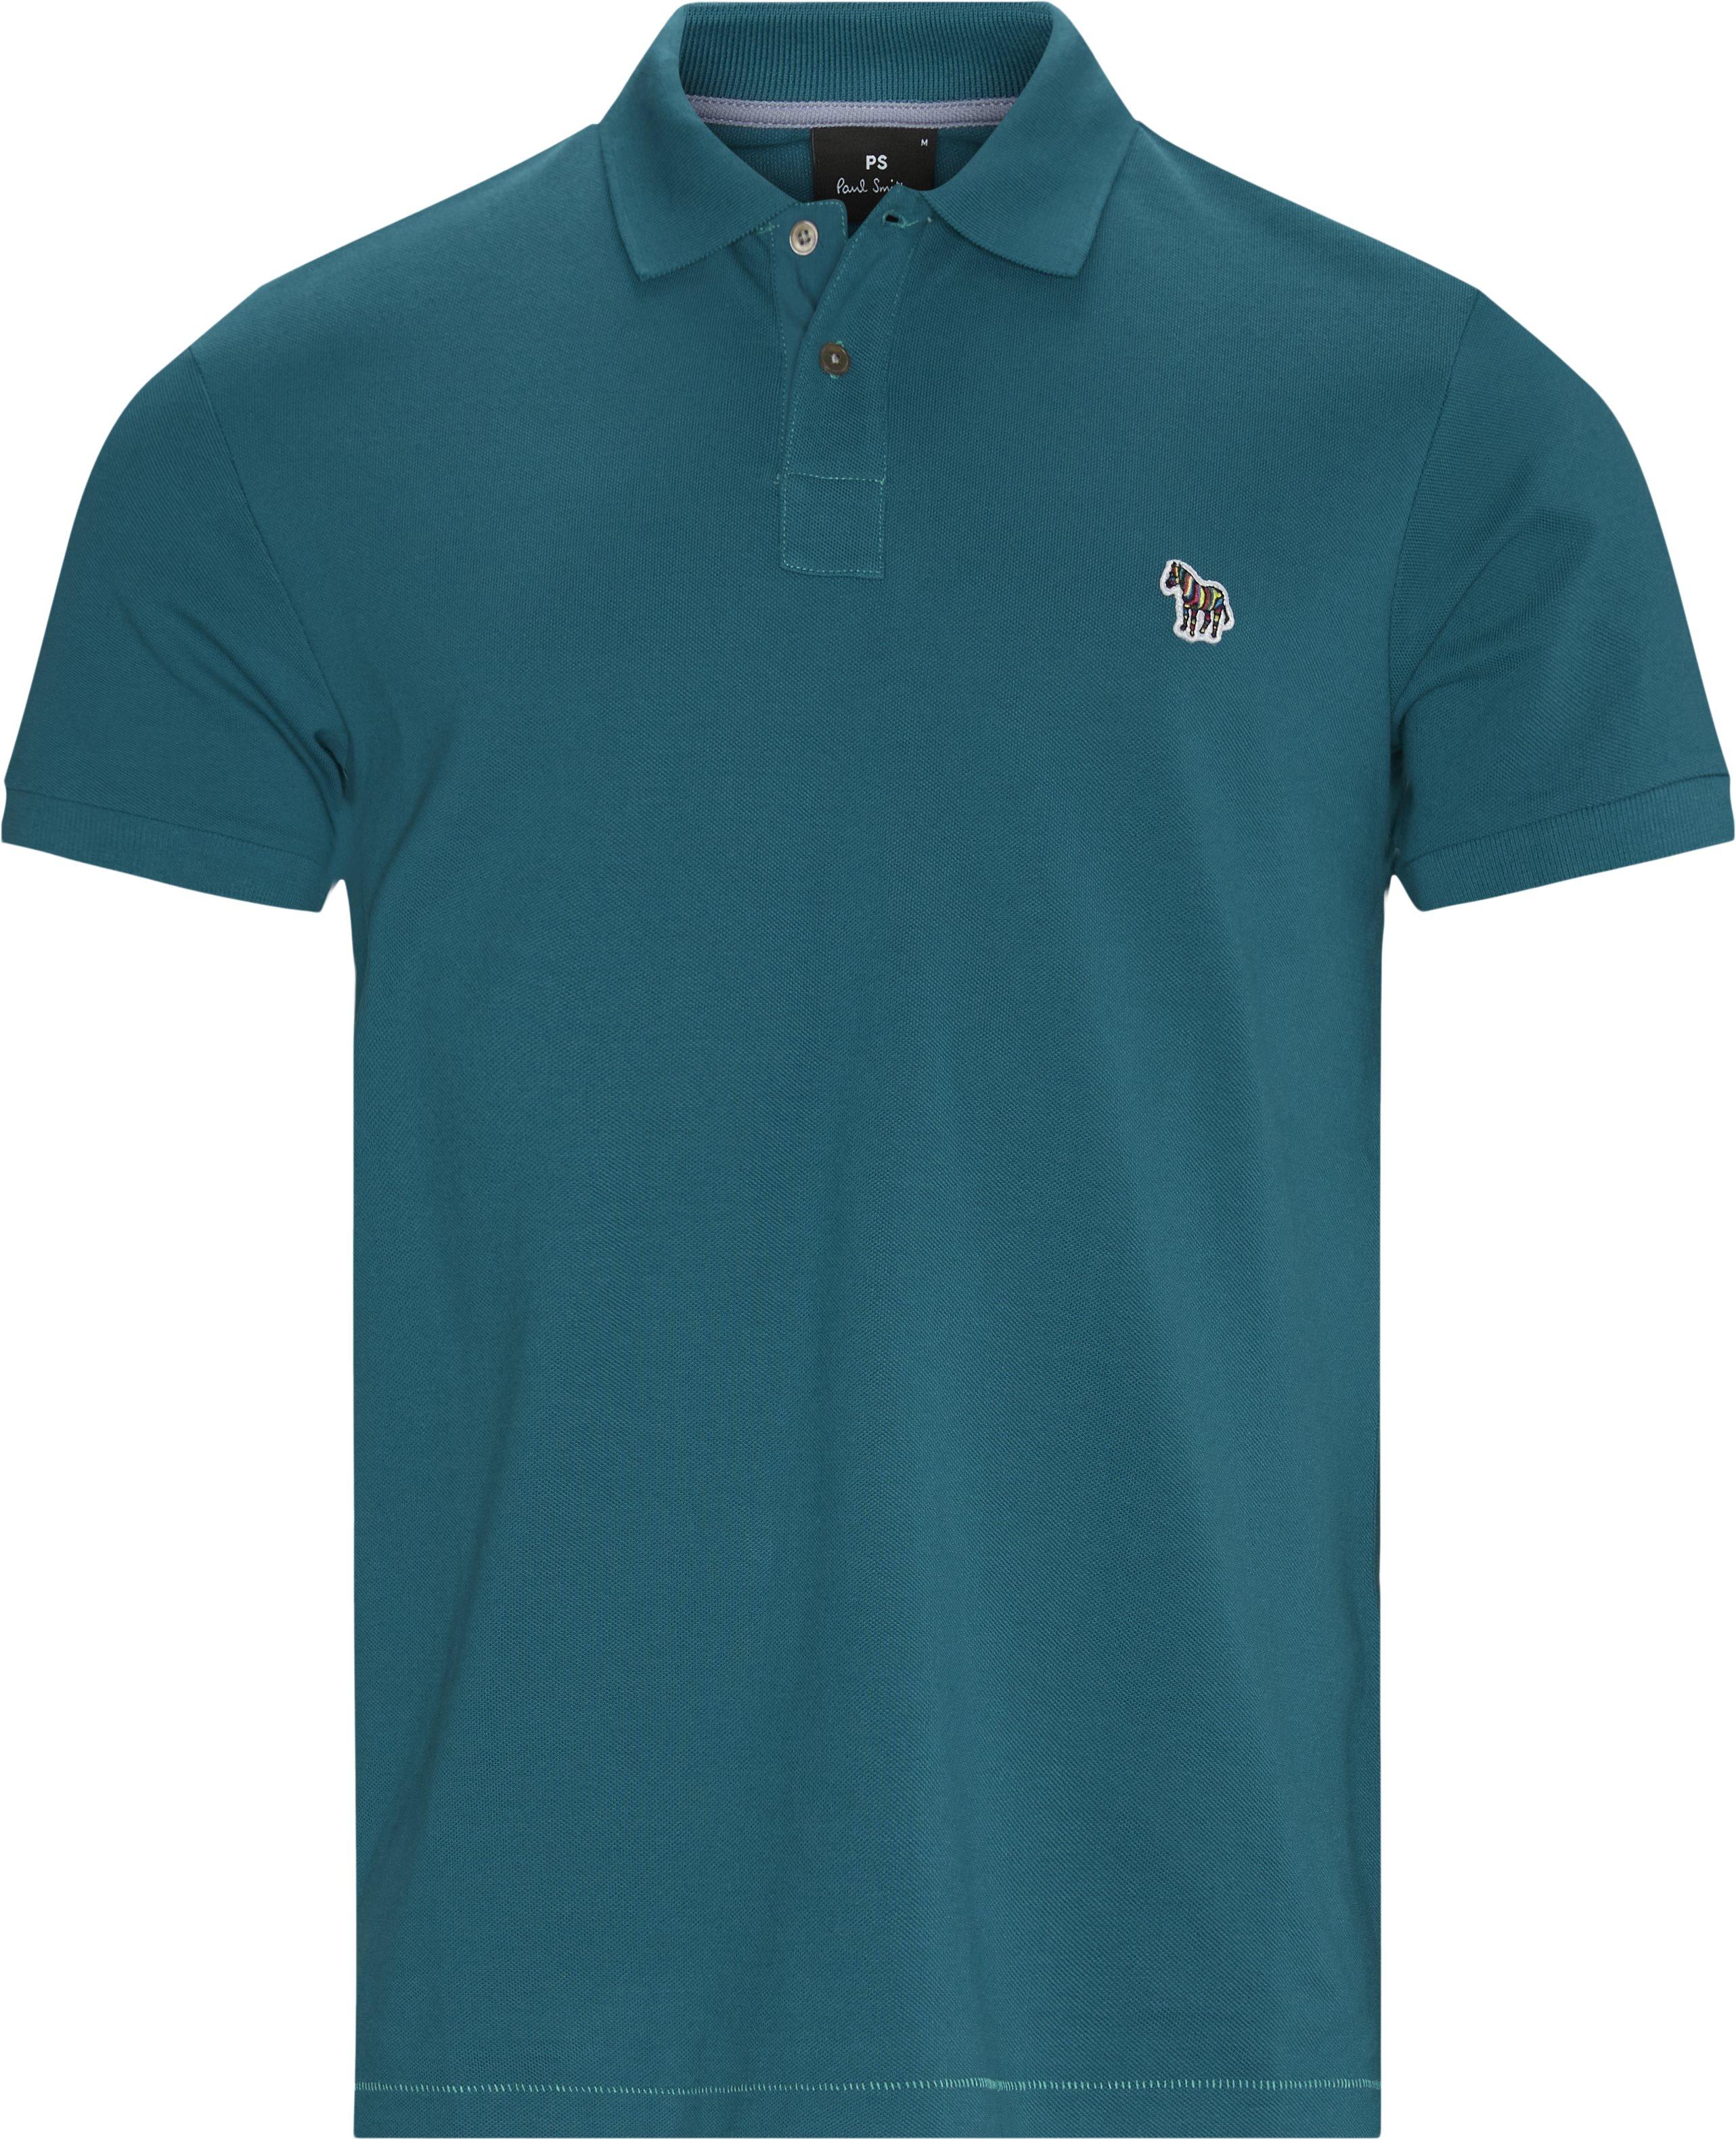 T-shirts - Regular fit - Green